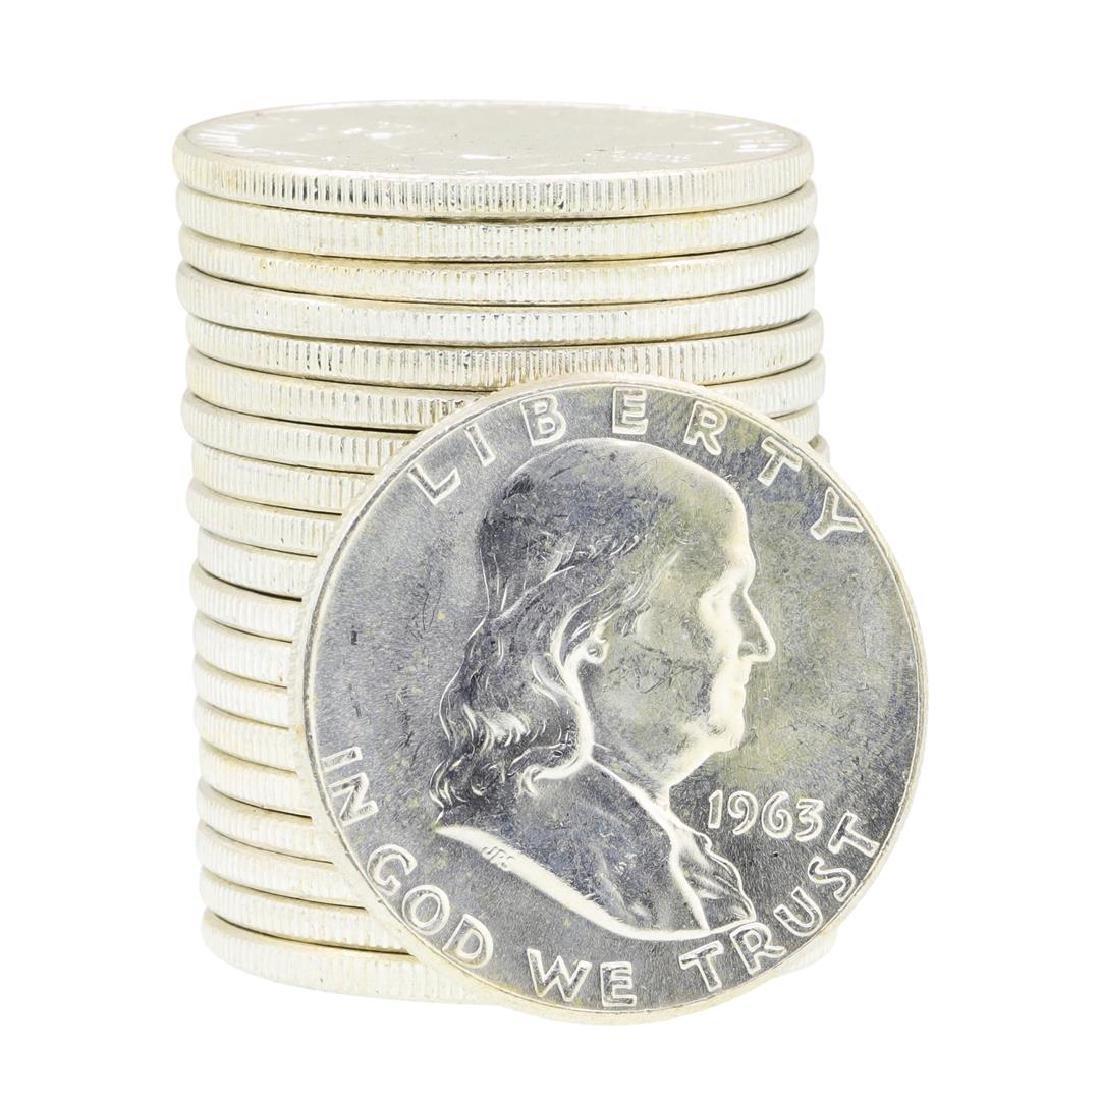 Tube of 20 1963 Franklin US Half Dollars